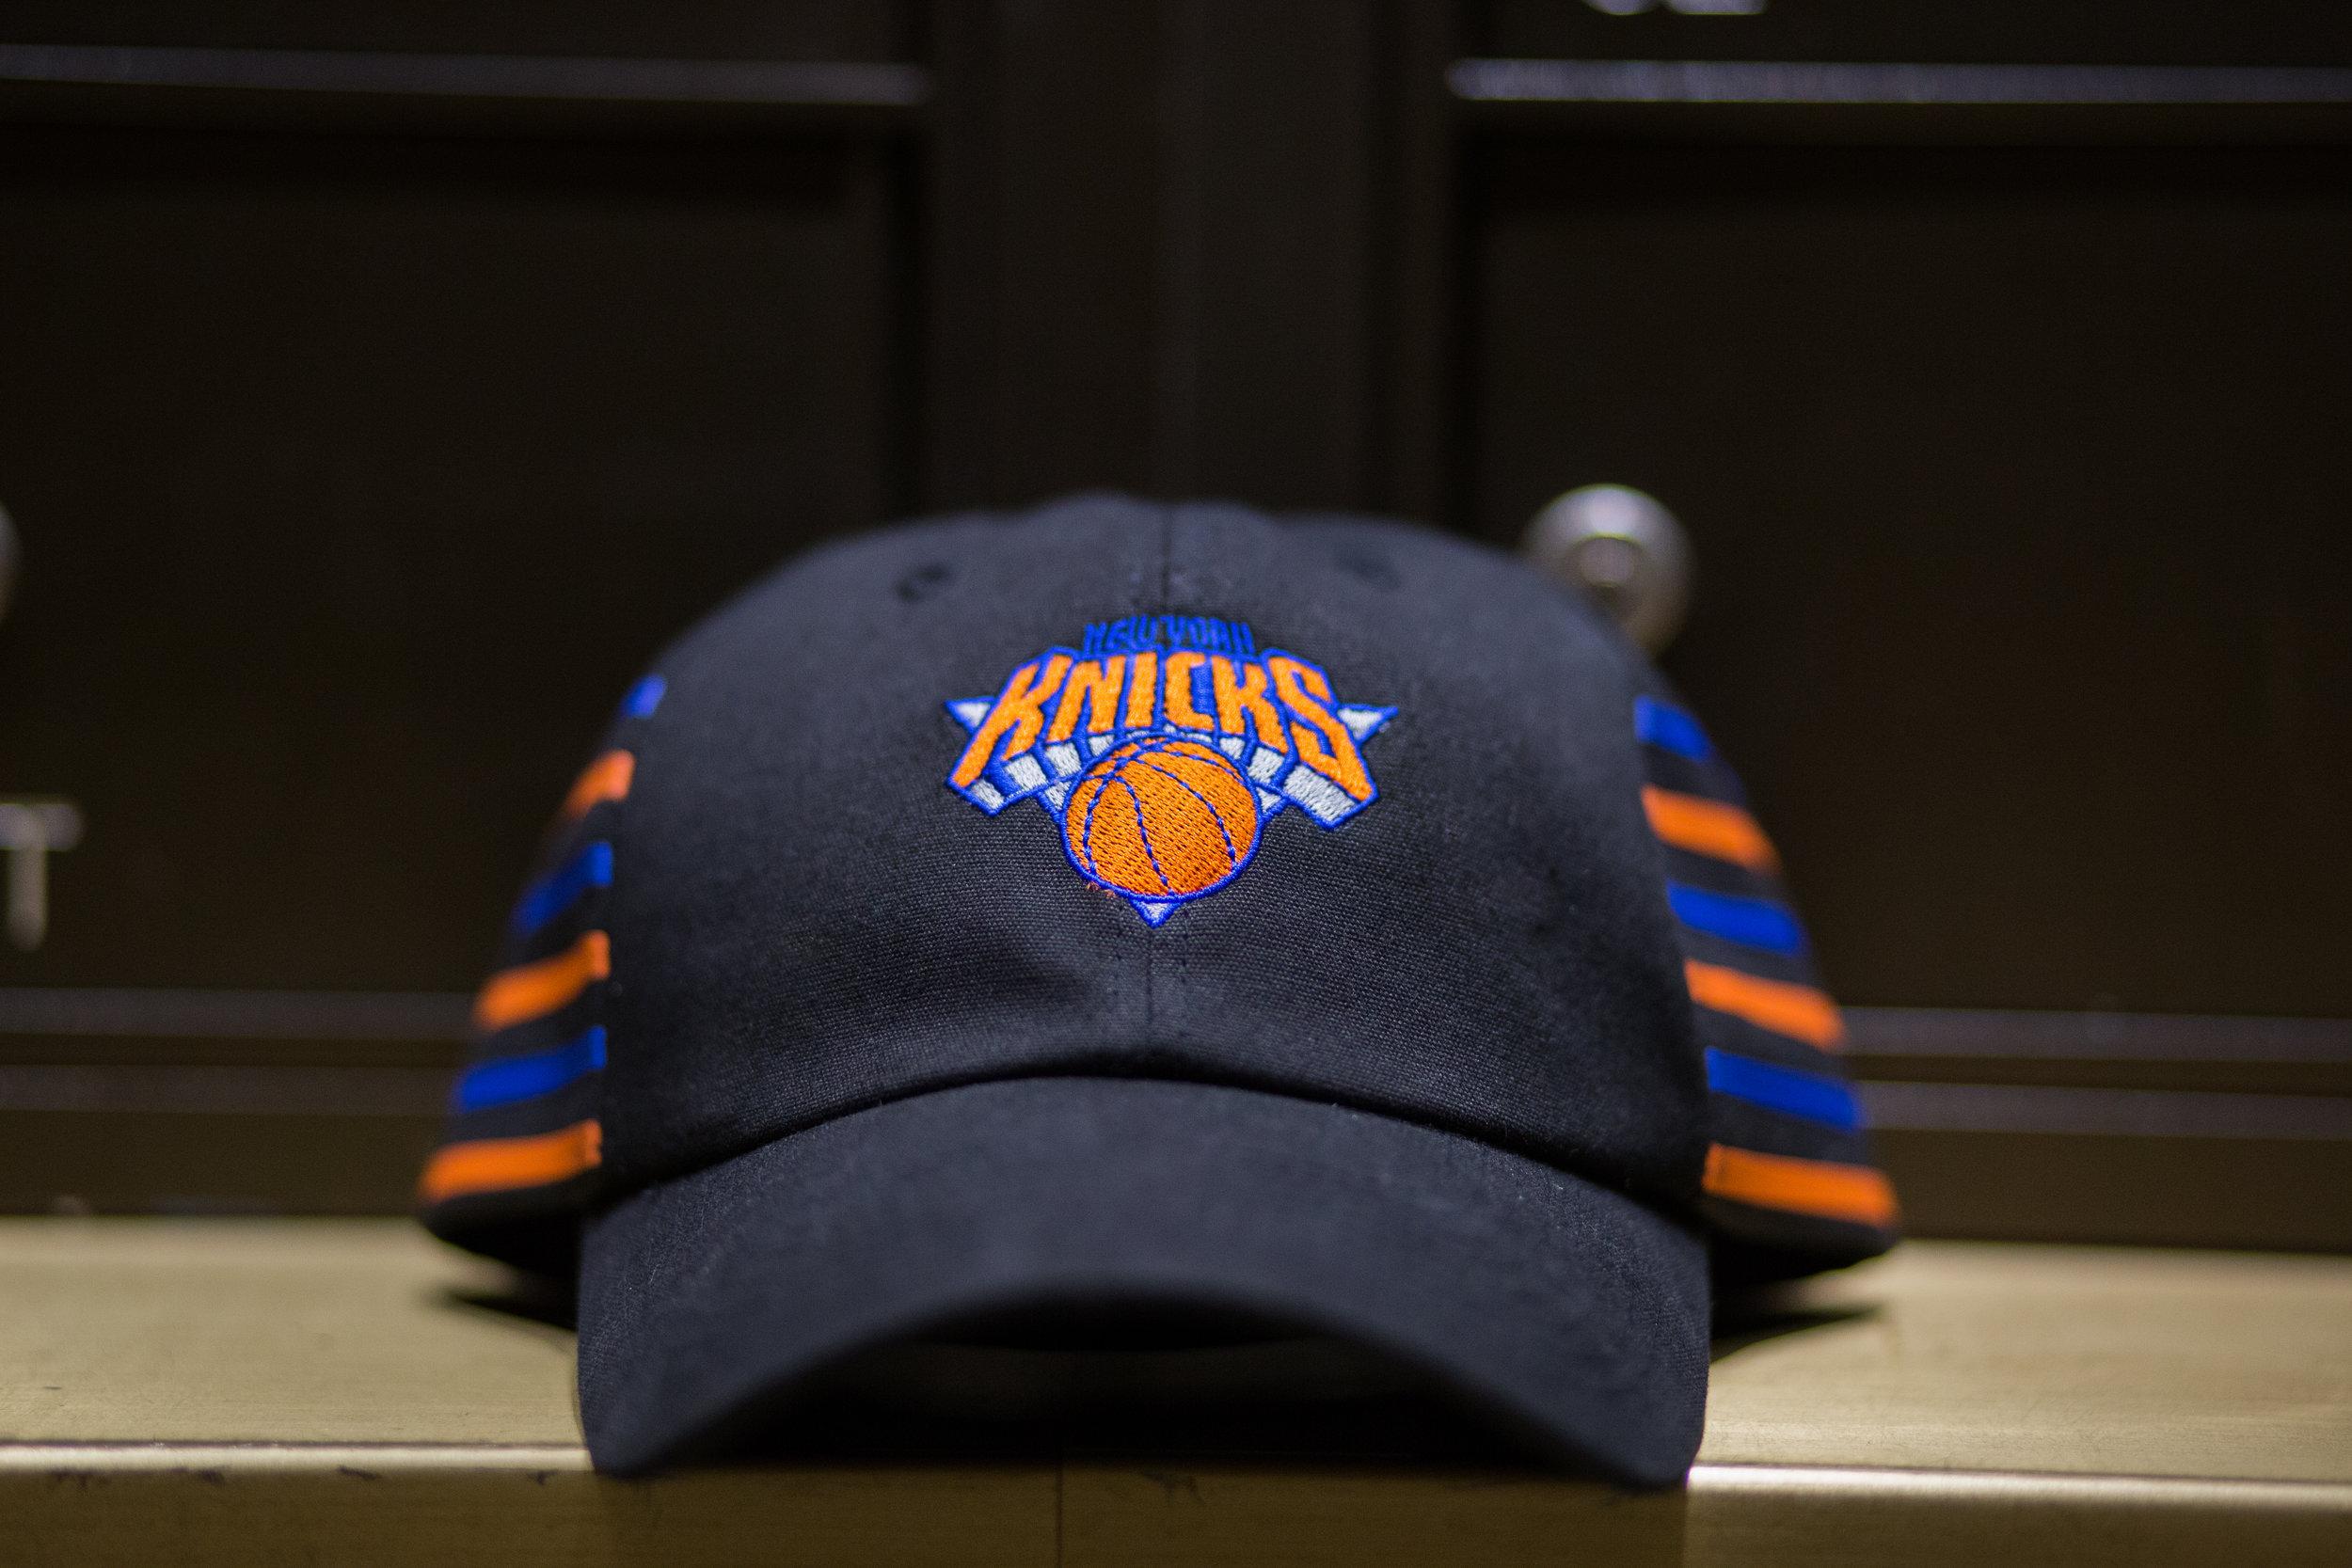 Grungy Gentleman x New York Knicks 15.jpg